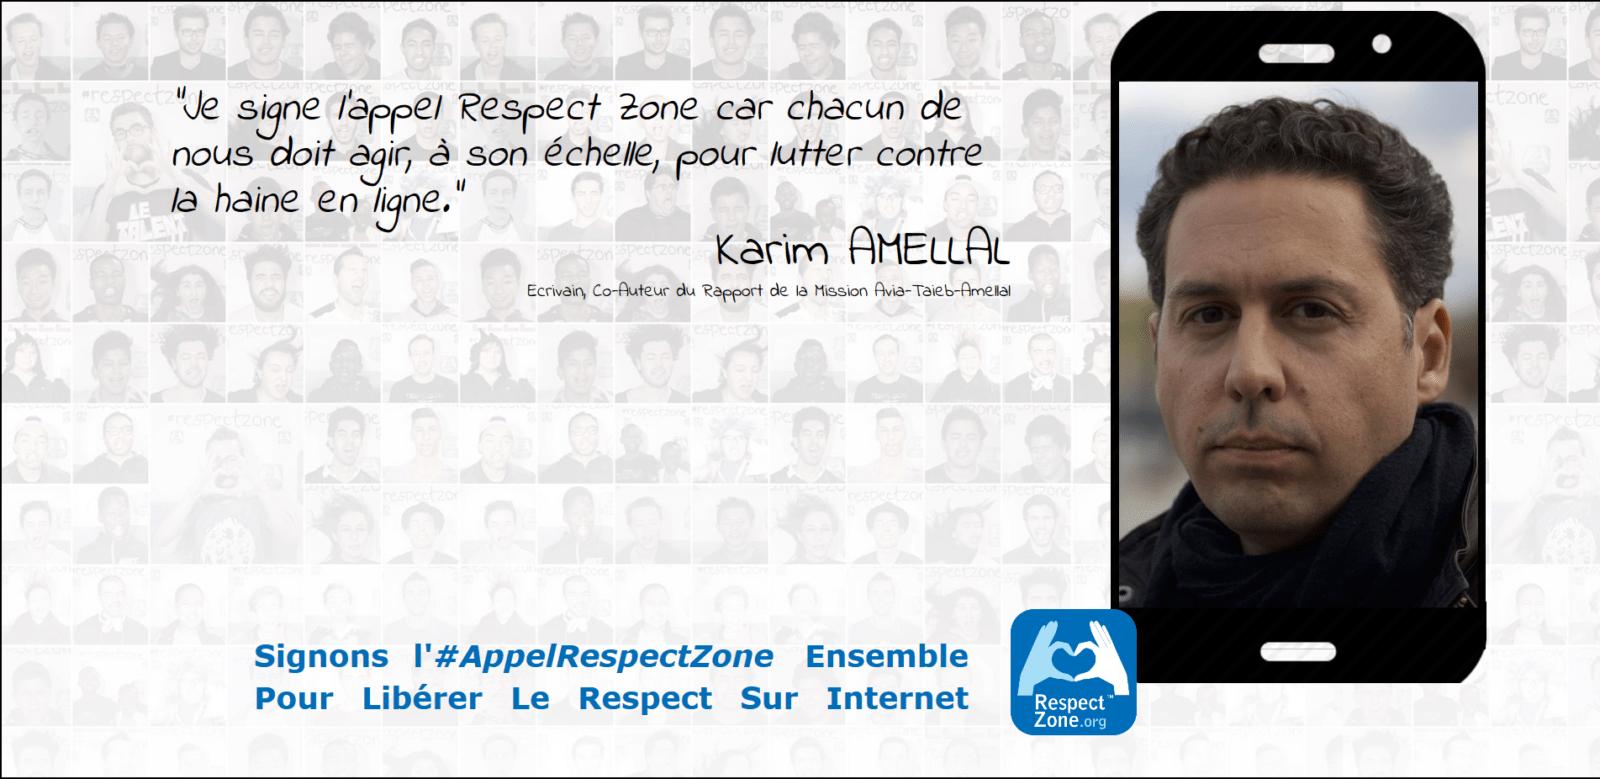 Karim AMELLAL